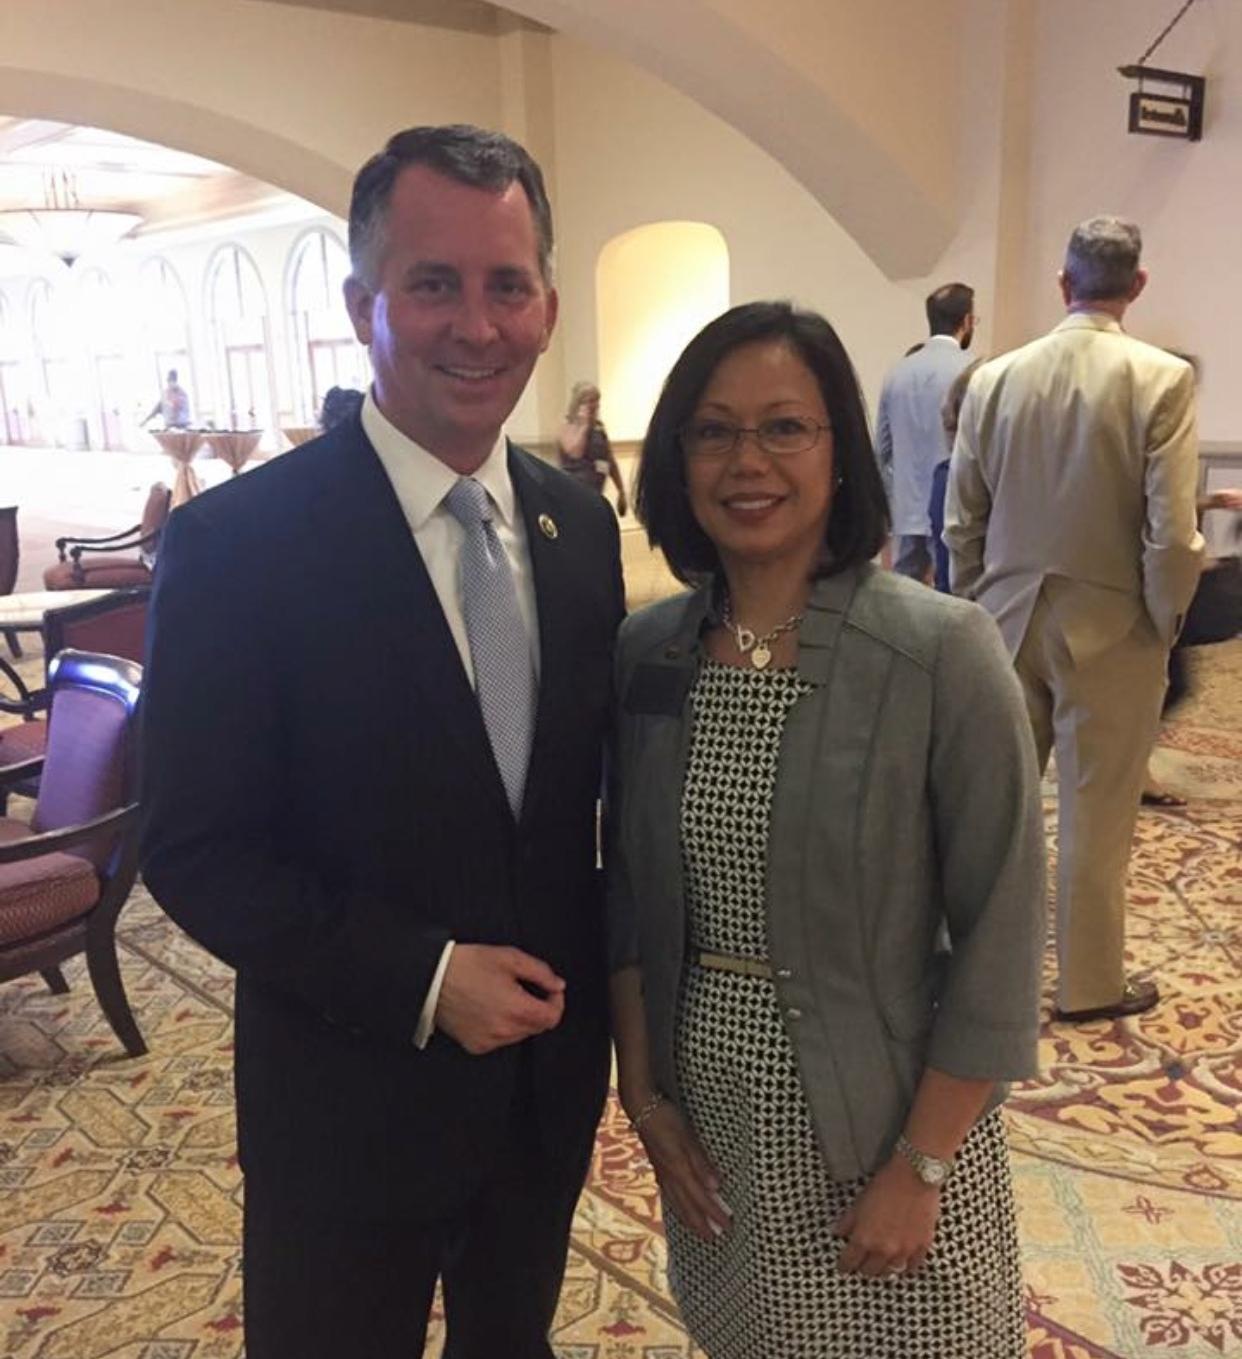 With former Congressman David Jolly